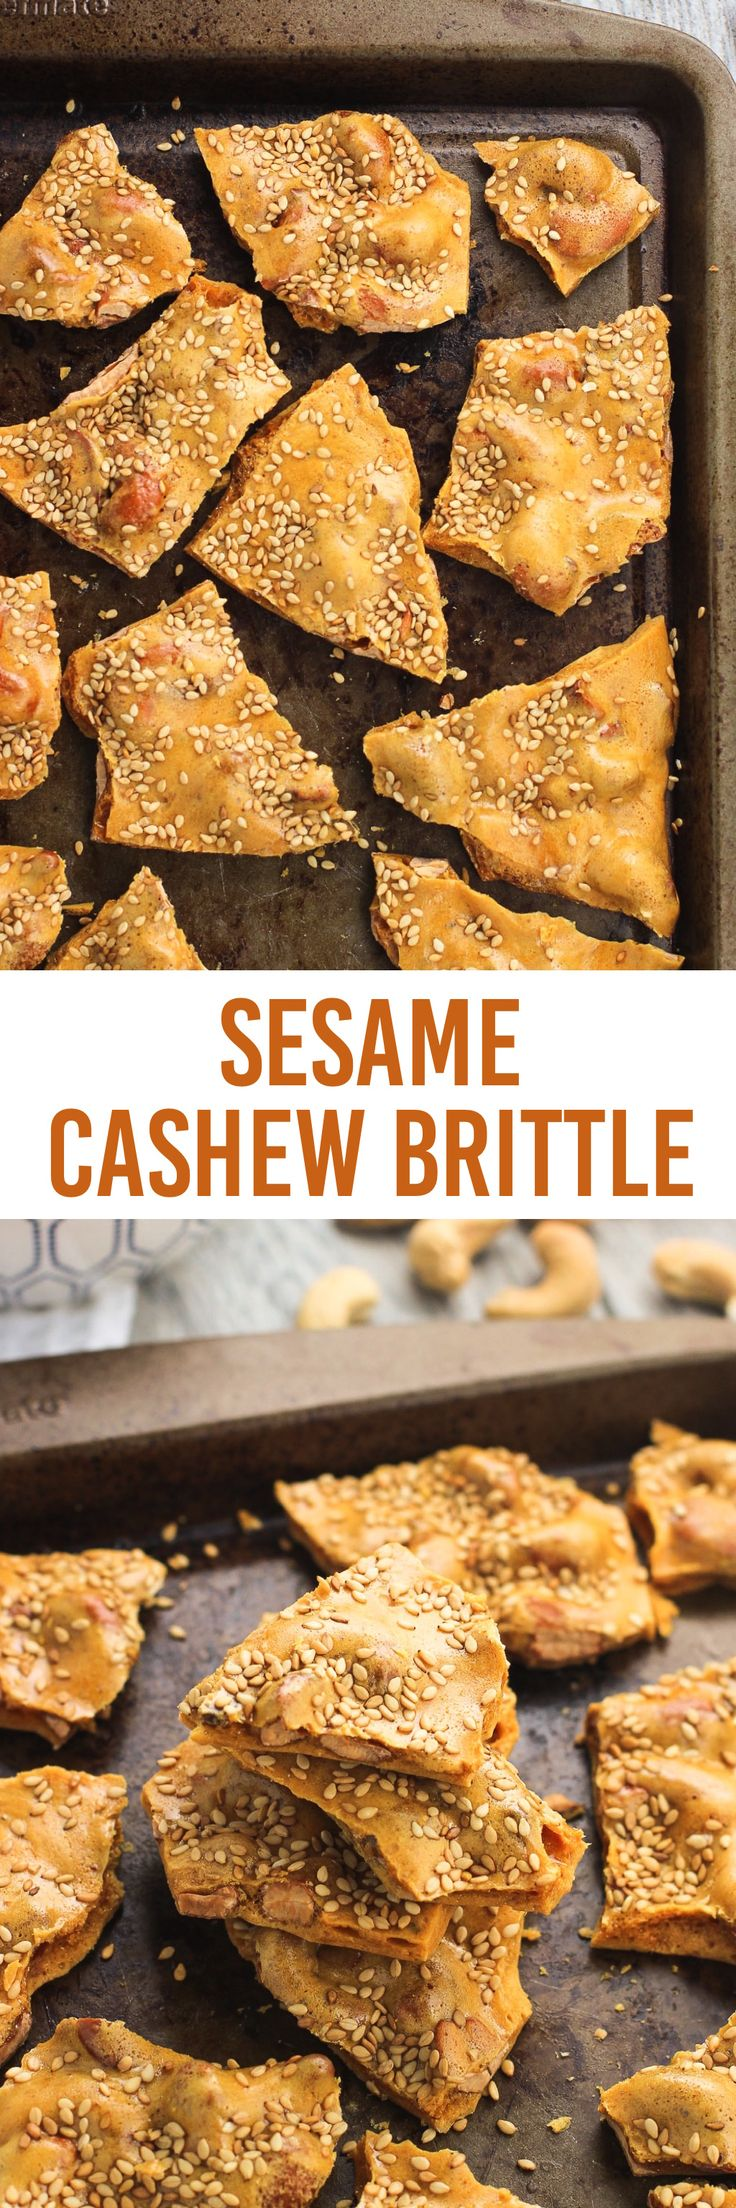 25+ best ideas about Cashew brittle on Pinterest   Candy ...